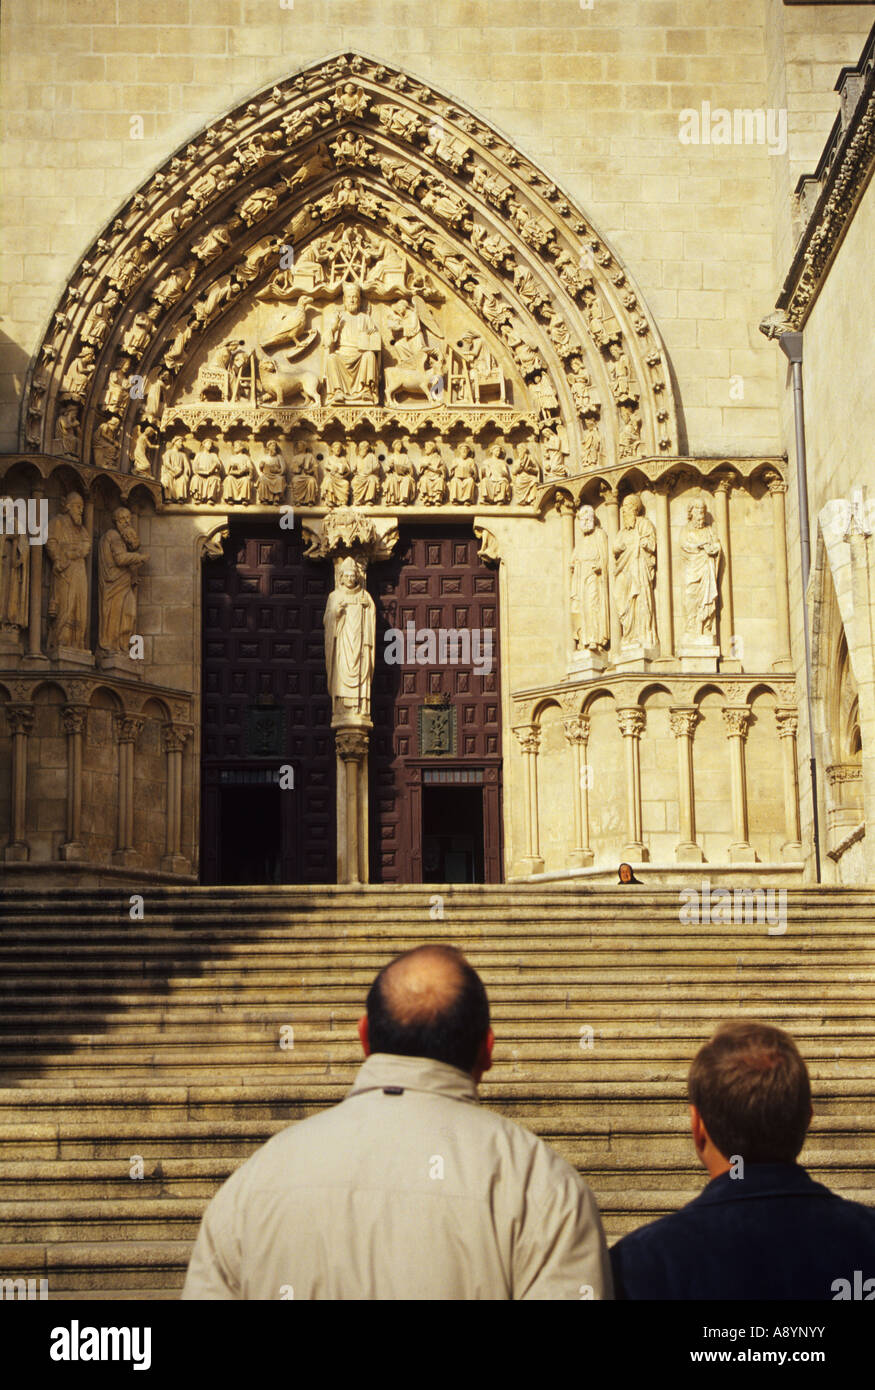 Burgos Cathedral BURGOS Castile and Leon Spain - Stock Image